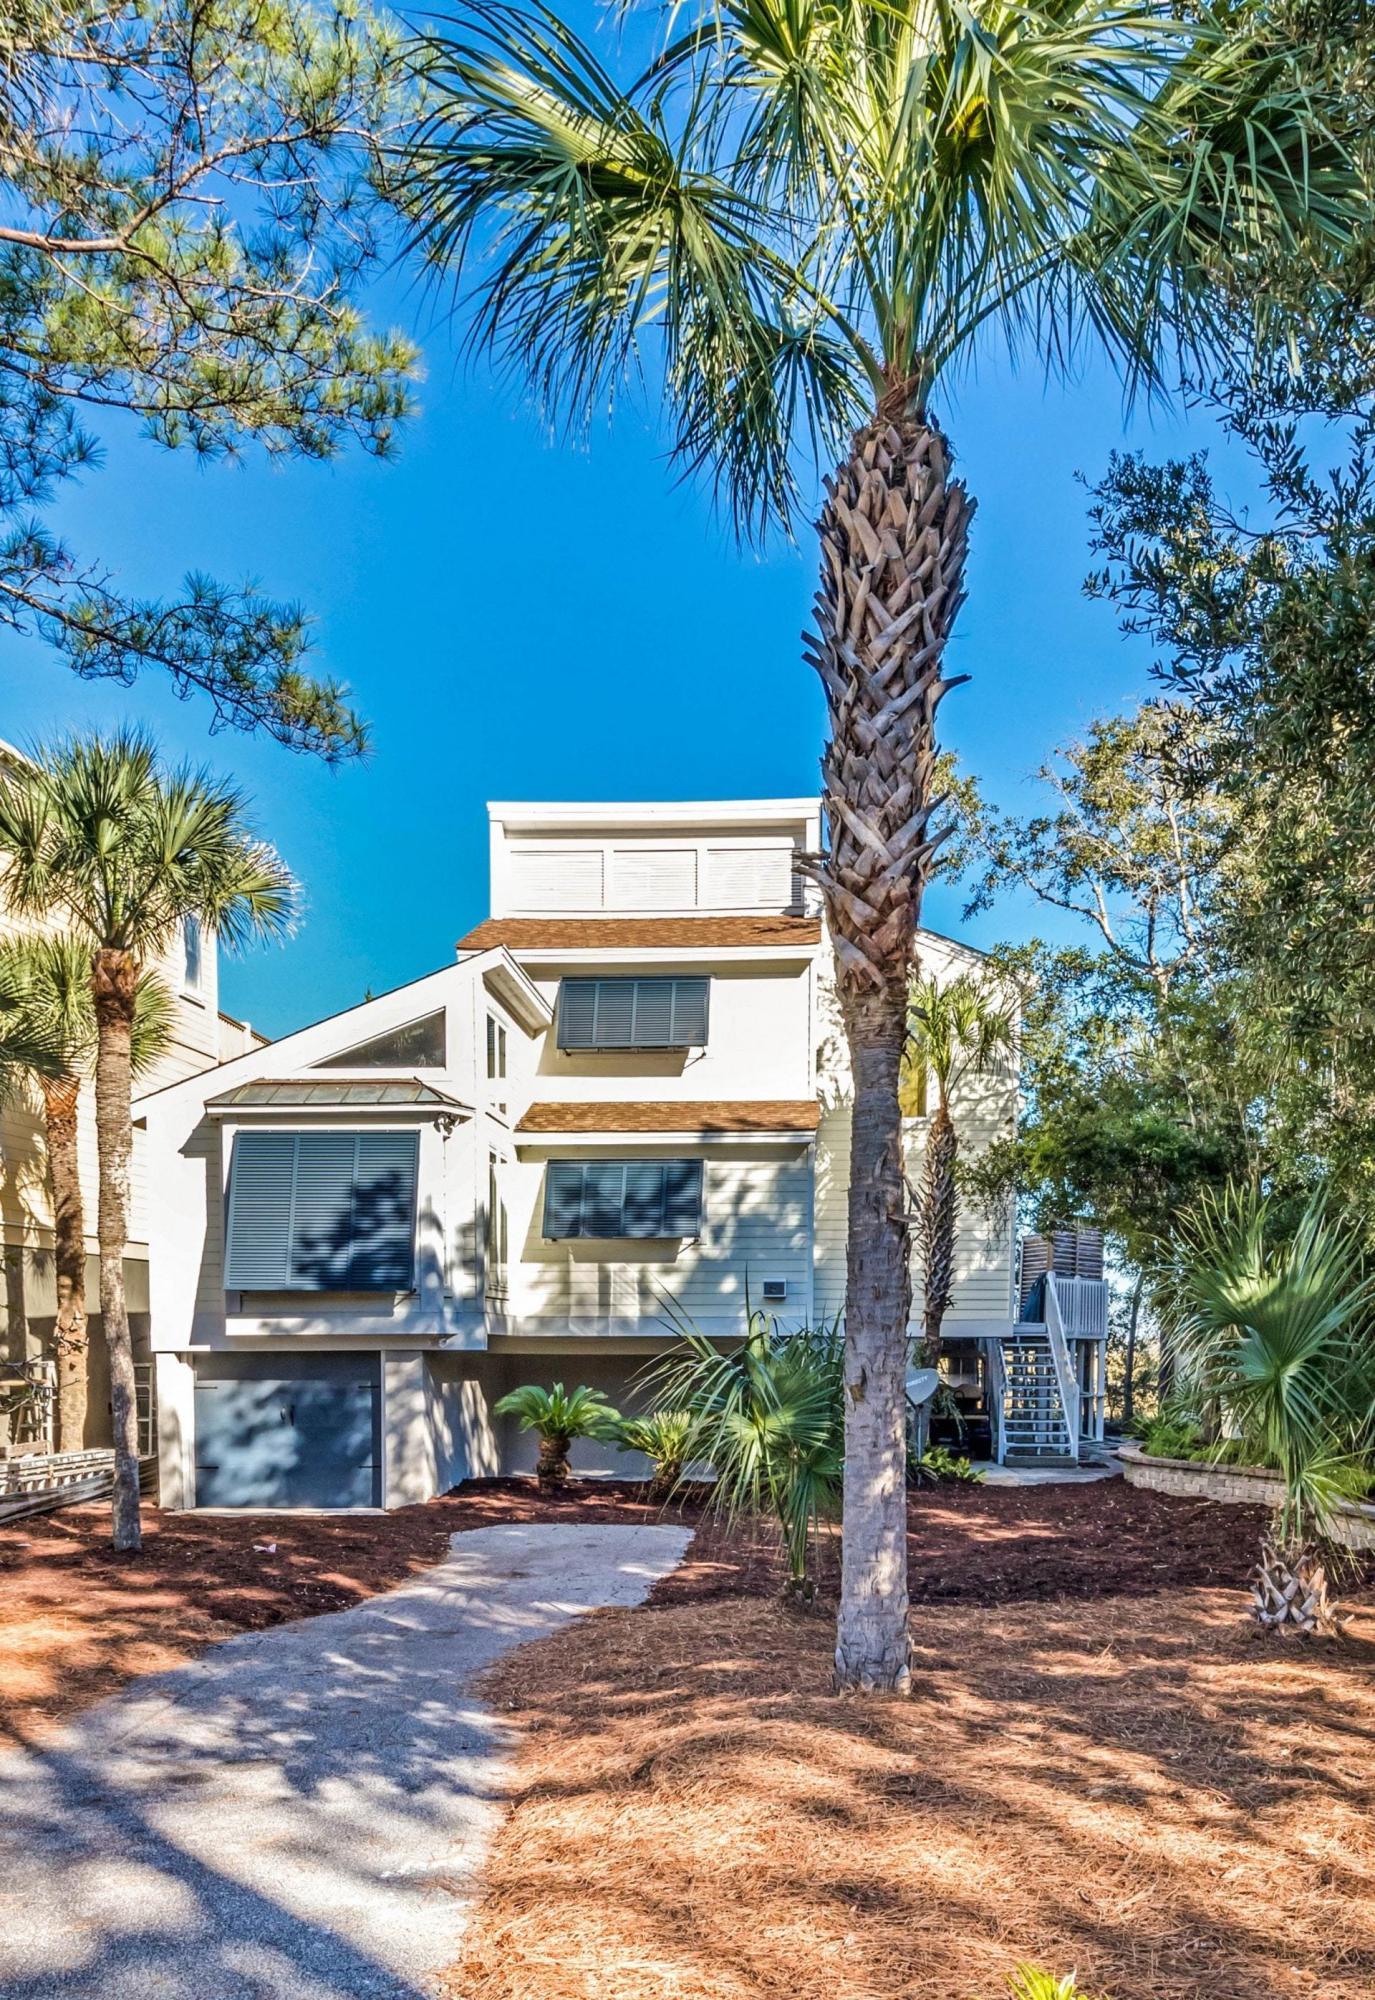 Wild Dunes Homes For Sale - 25 Marsh Island, Isle of Palms, SC - 15